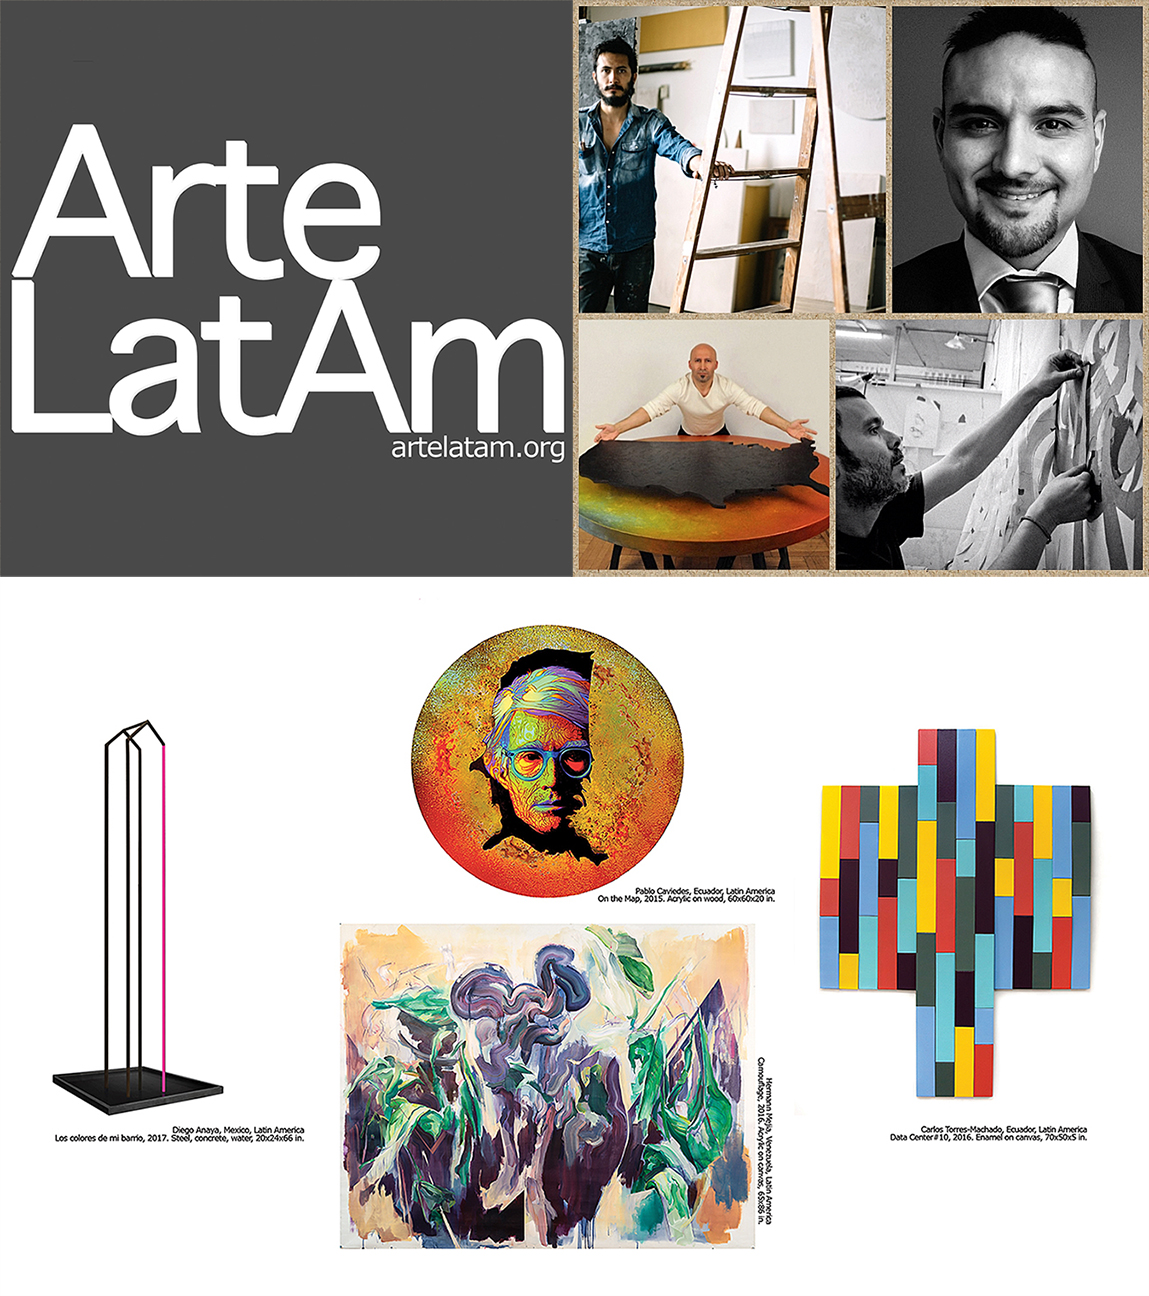 ArteLatAm exhibition painting gallery collector latinamerican art New York Pablo Caviedes, Diego Anaya, Hermann Mejia Carlos Torres-Machado